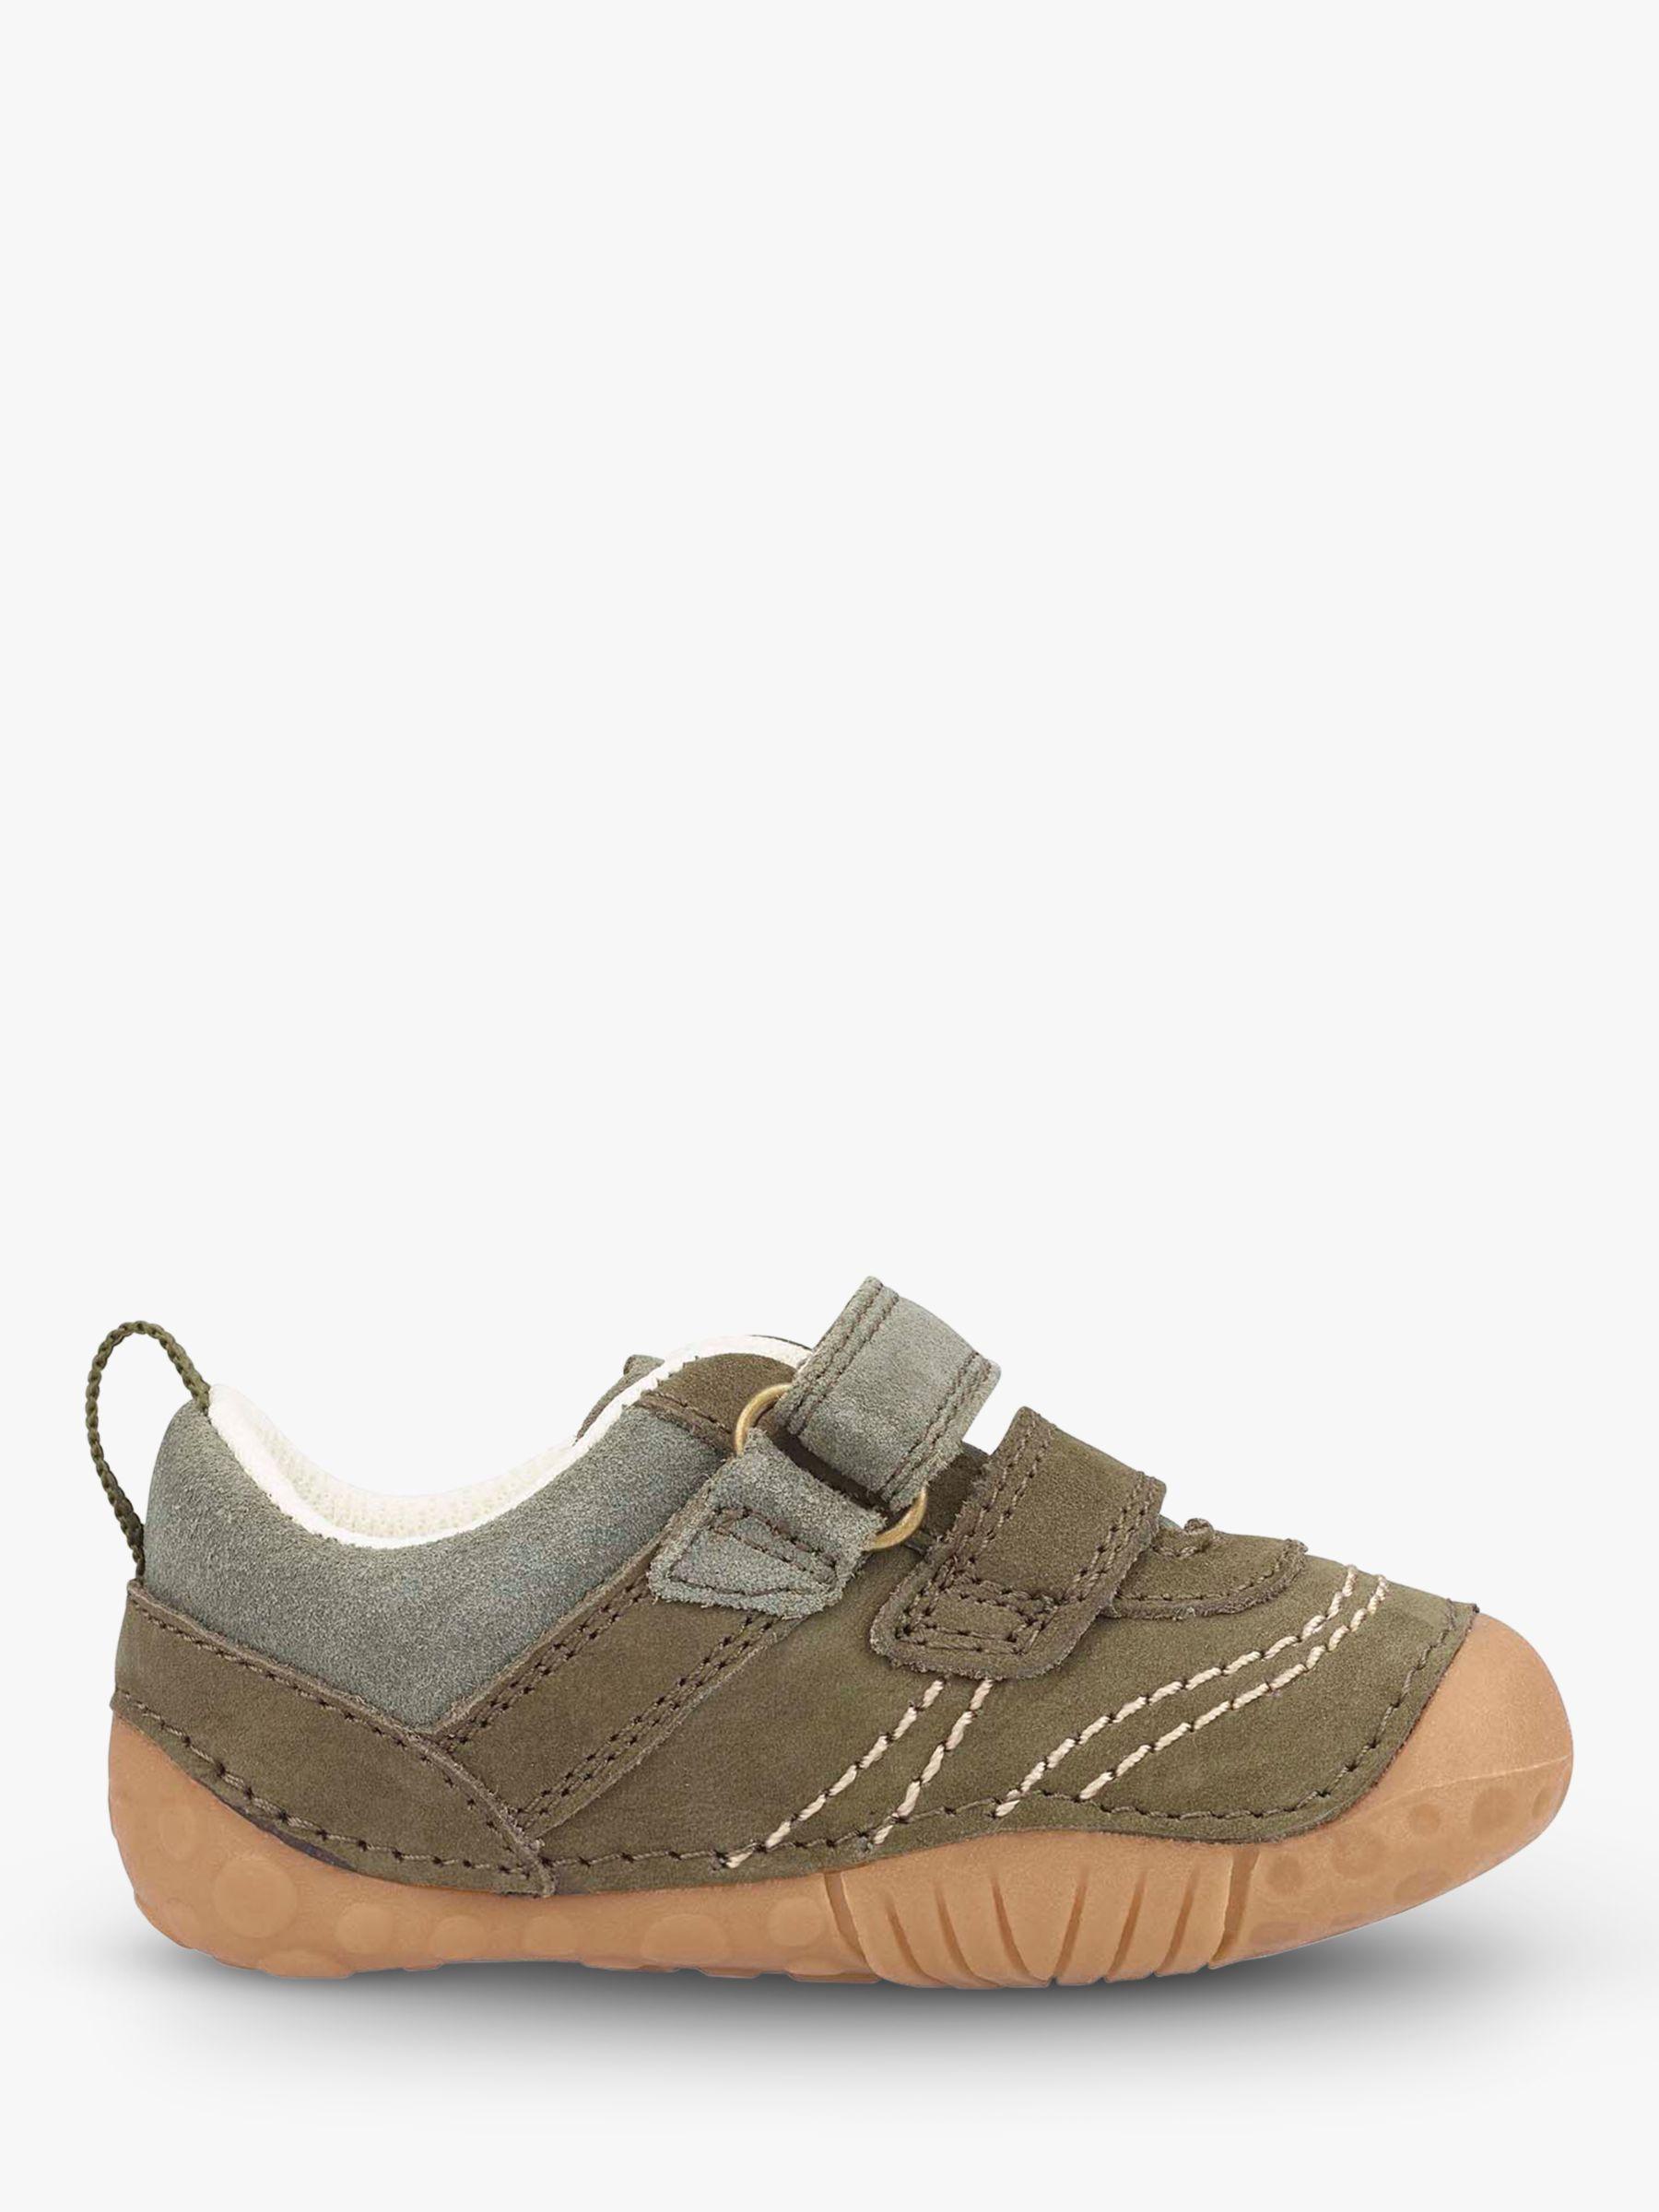 Start-Rite Start-rite Children's Baby Leo First Shoes, Khaki